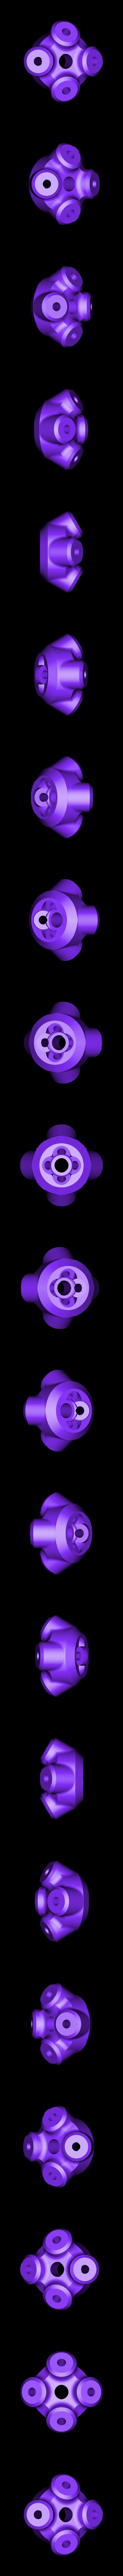 FOLDING_GRAPPLE_10MM.stl Download free STL file FOLDING GRAPPLE HOOK • 3D printing design, MuSSy